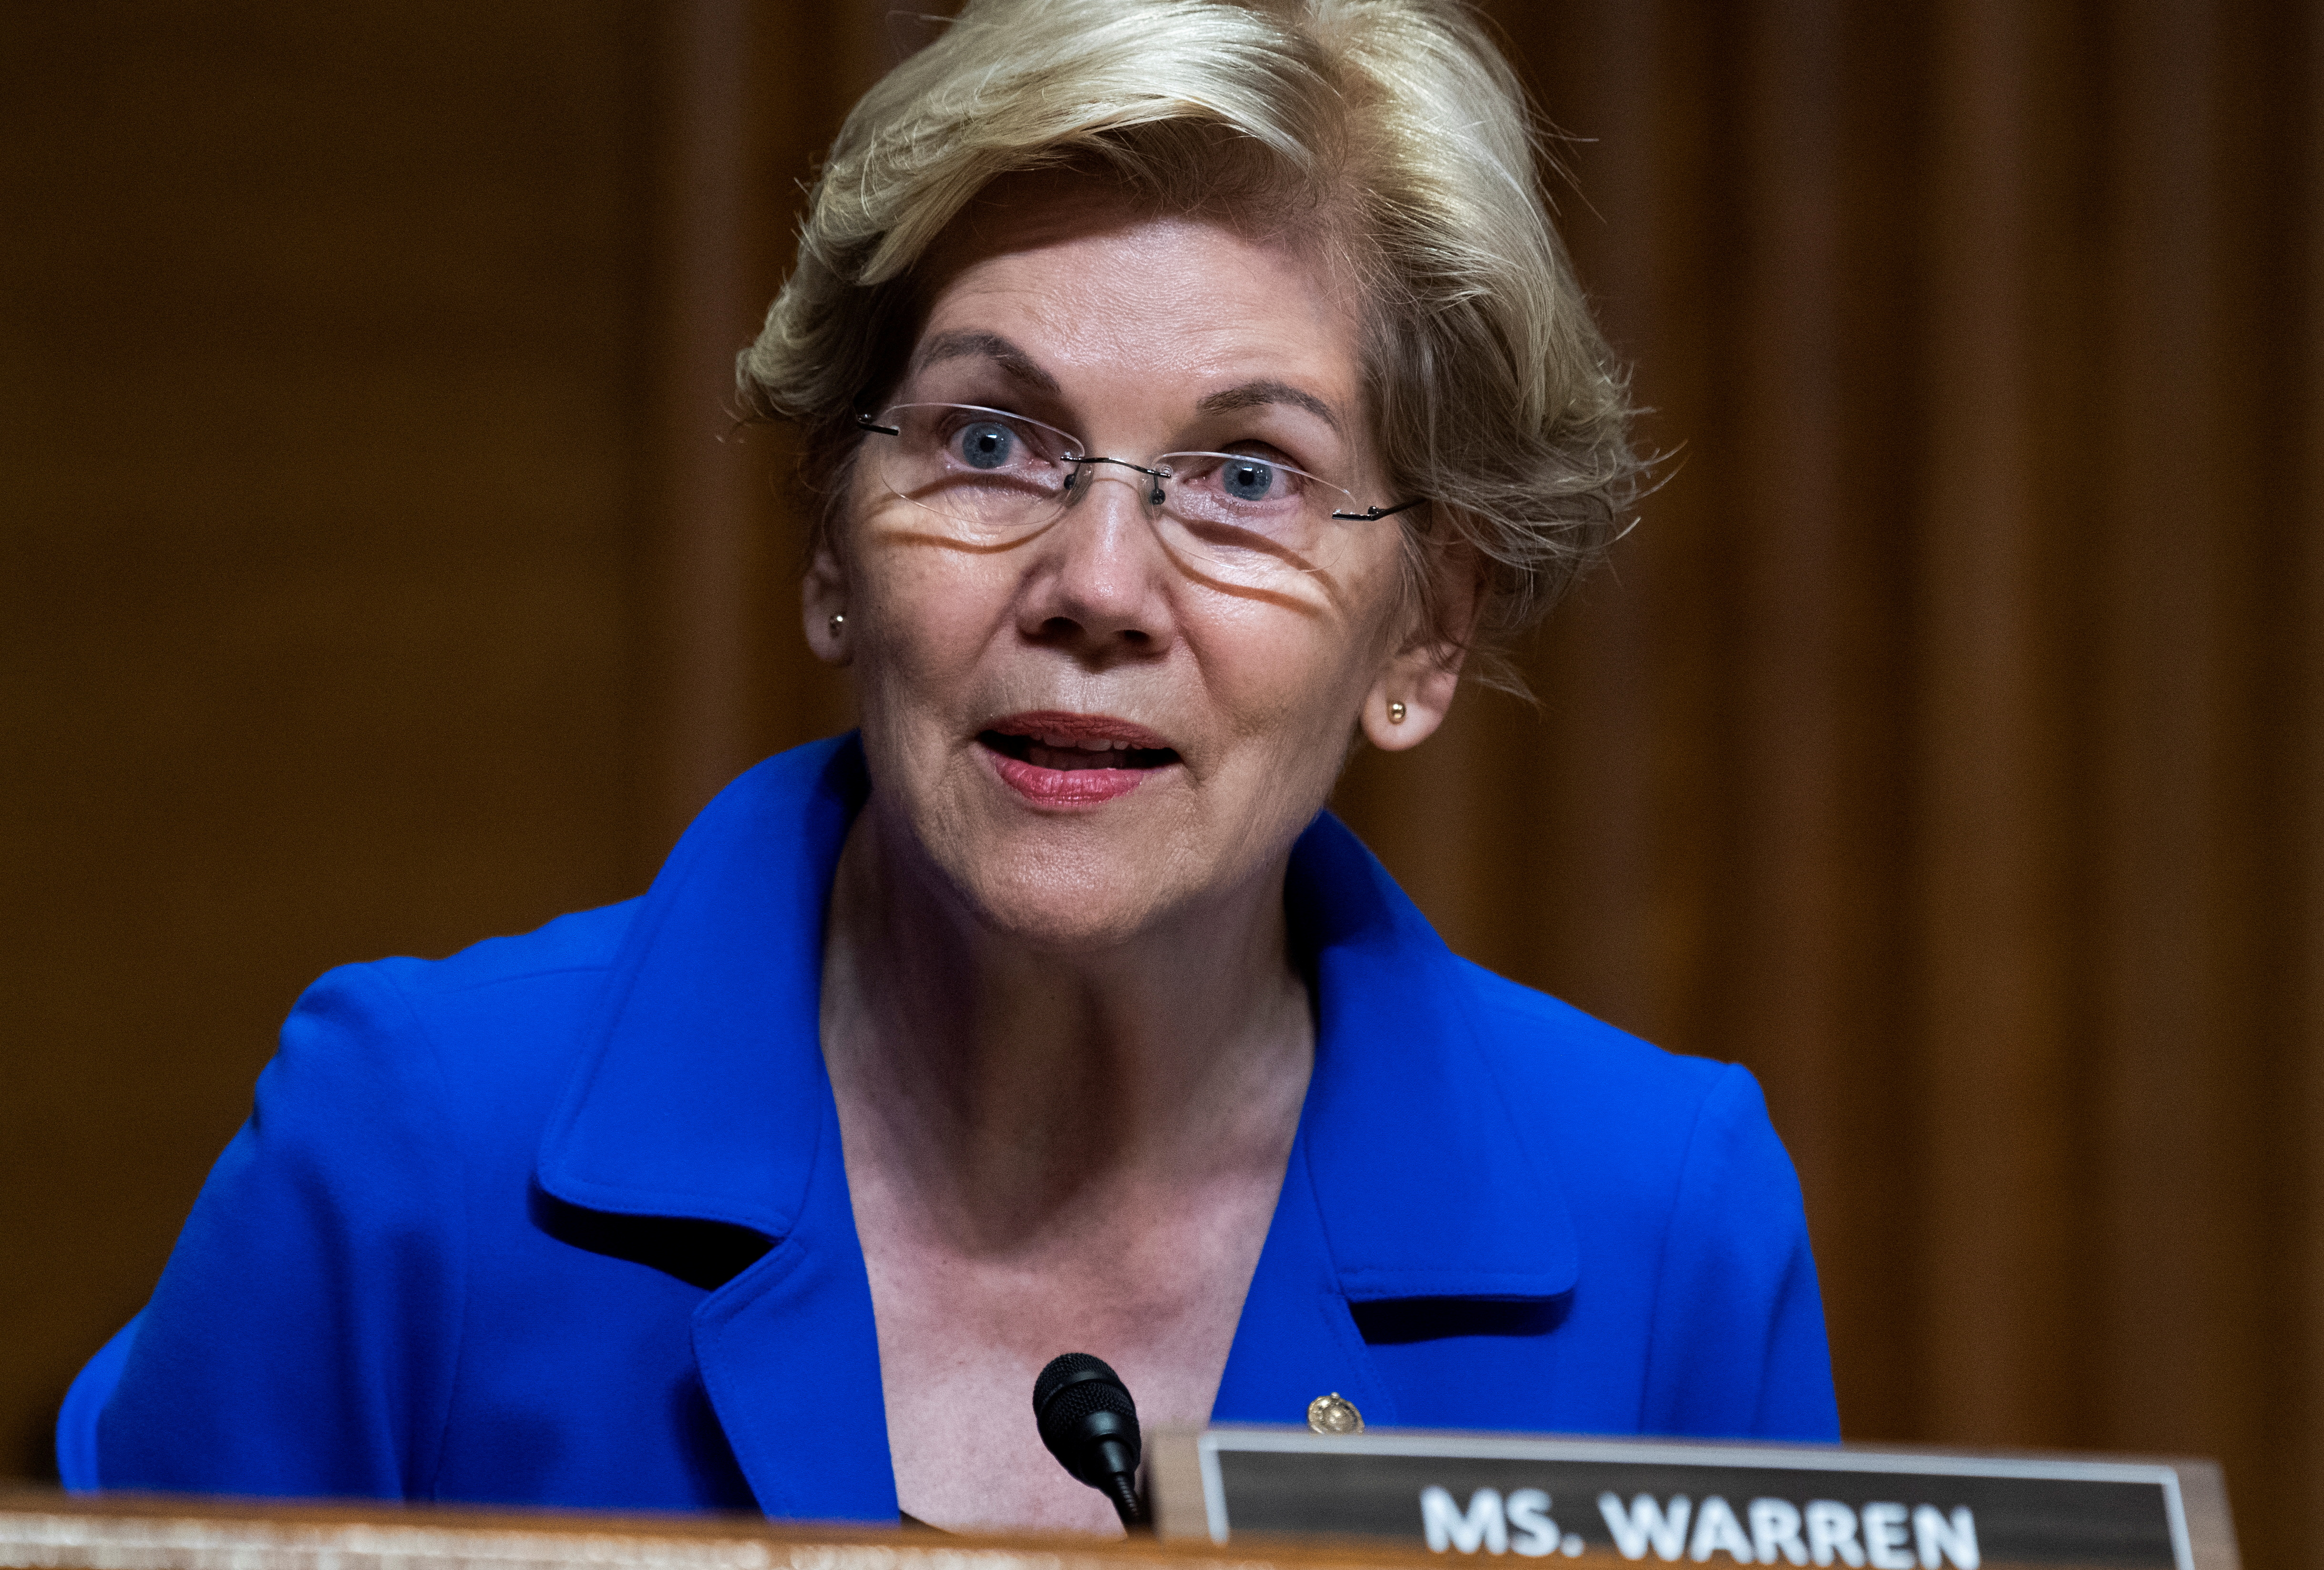 File photo: U.S. Senator Elizabeth Warren at a Senate Finance Committee hearing in Washington, D.C. Tom Williams/Pool via REUTERS